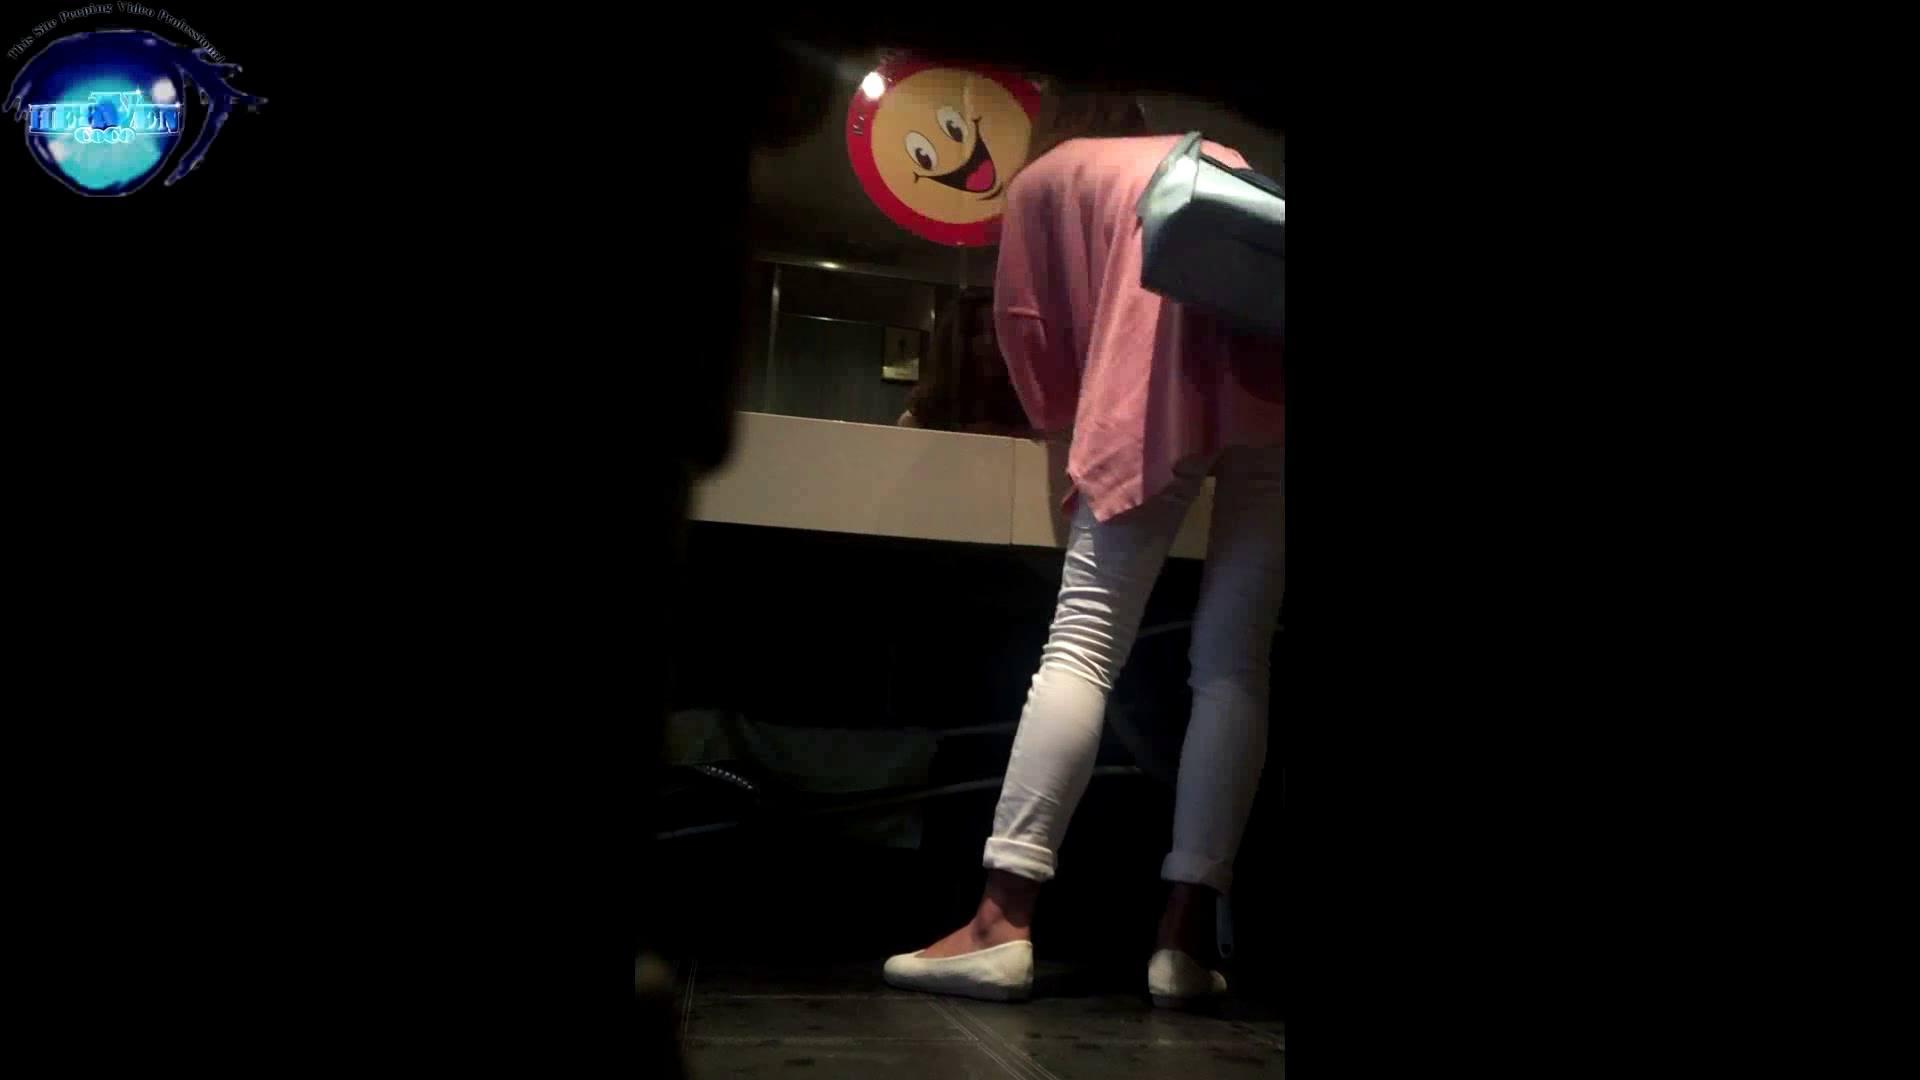 GOD HAND ファッションショッピングセンター盗撮vol.03後編 高画質 おまんこ無修正動画無料 96pic 89